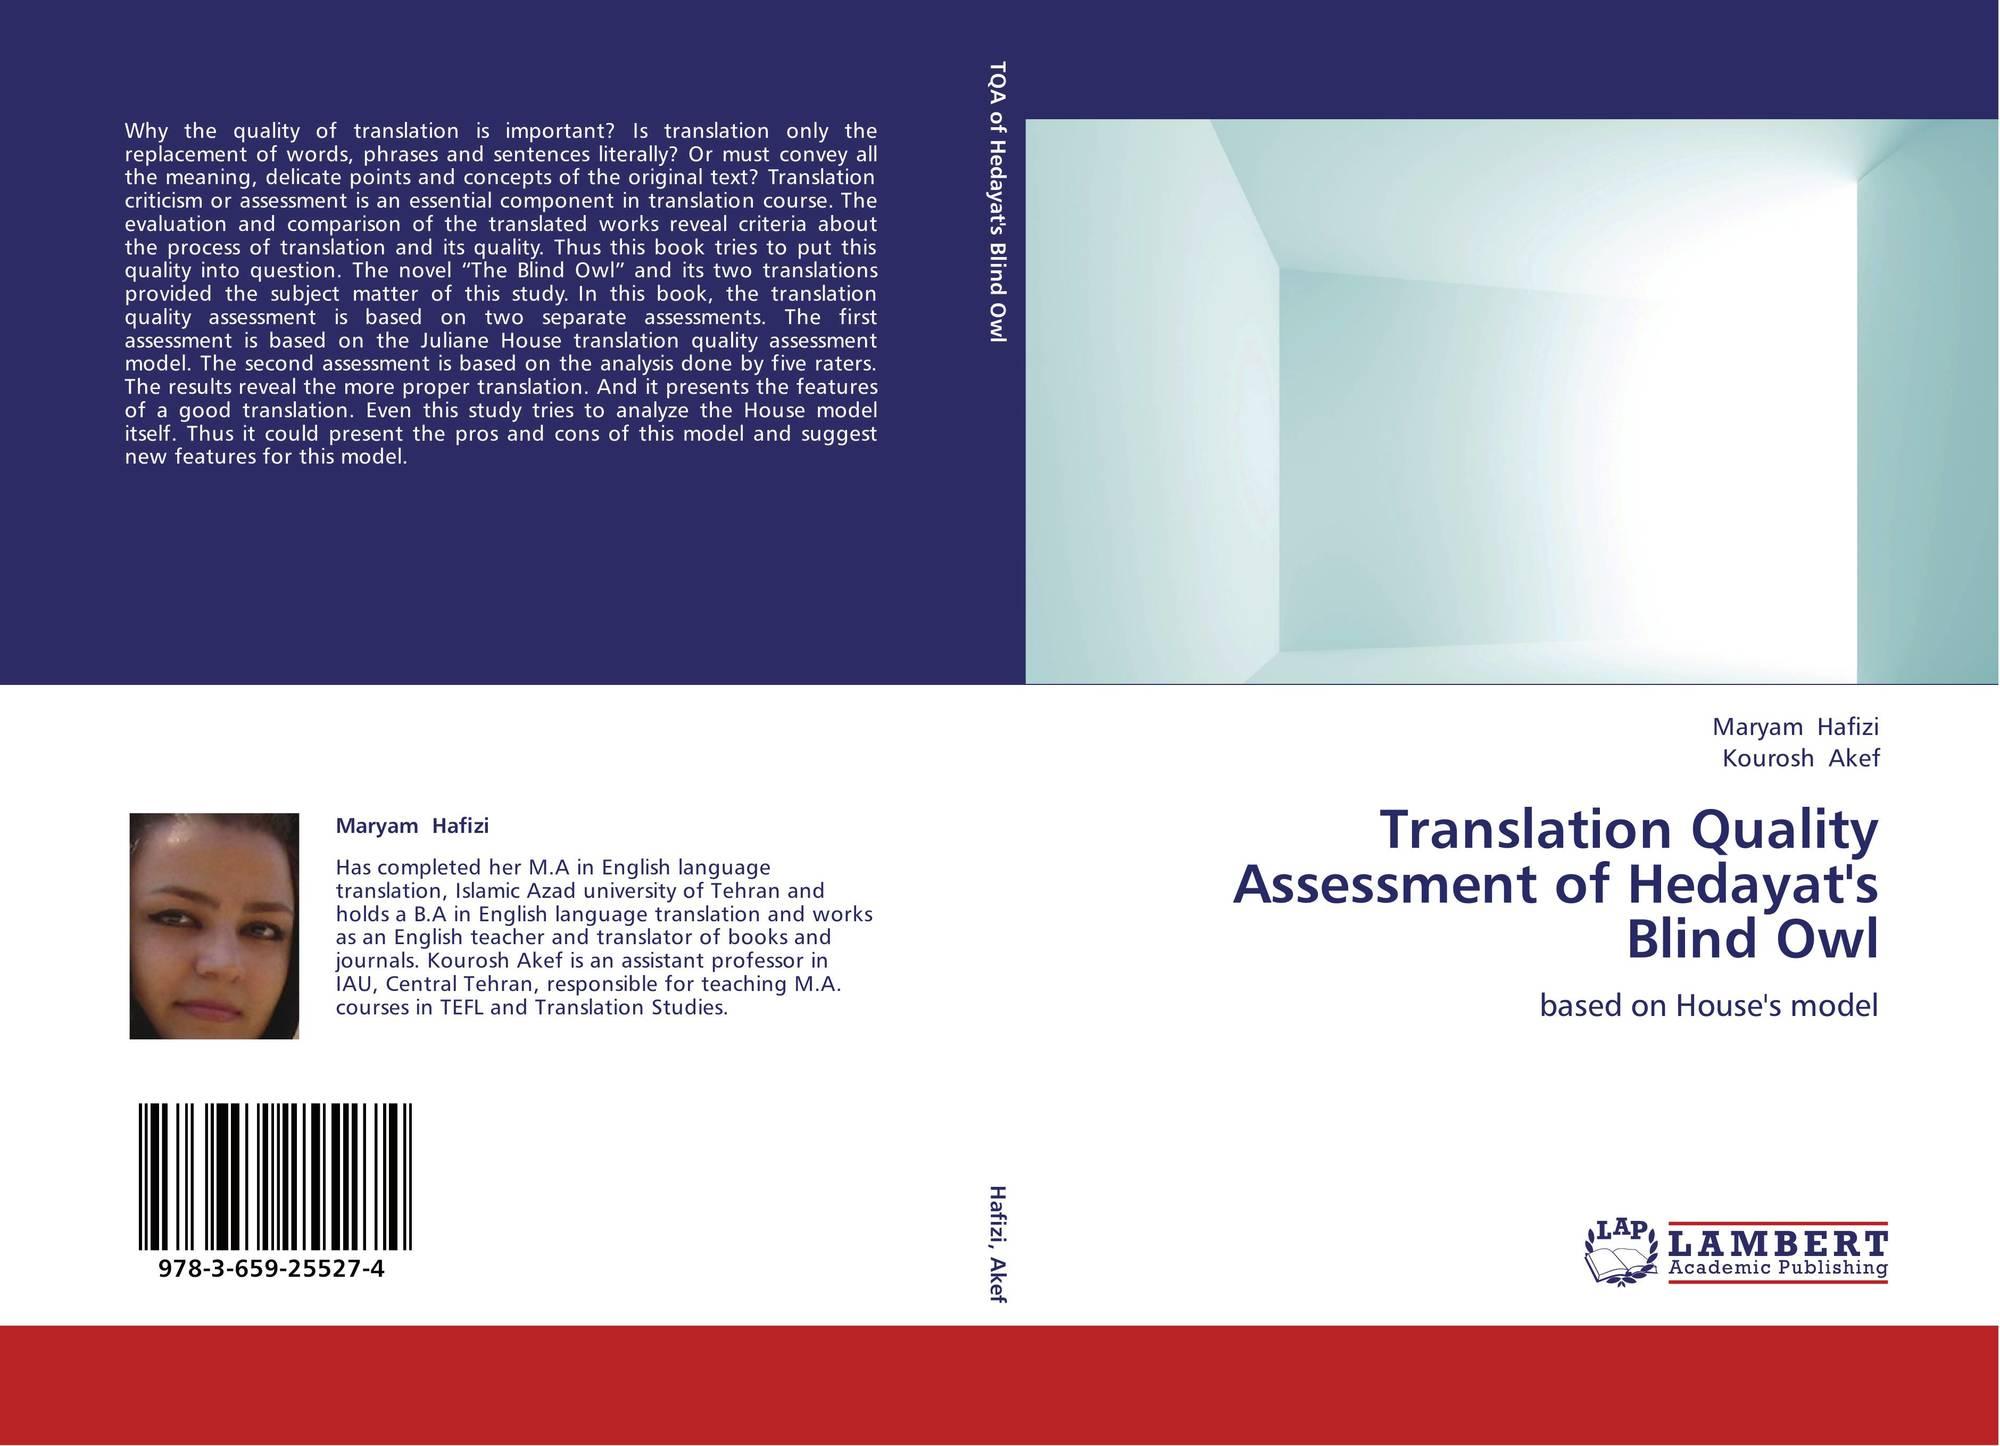 House a model for translation quality assessment